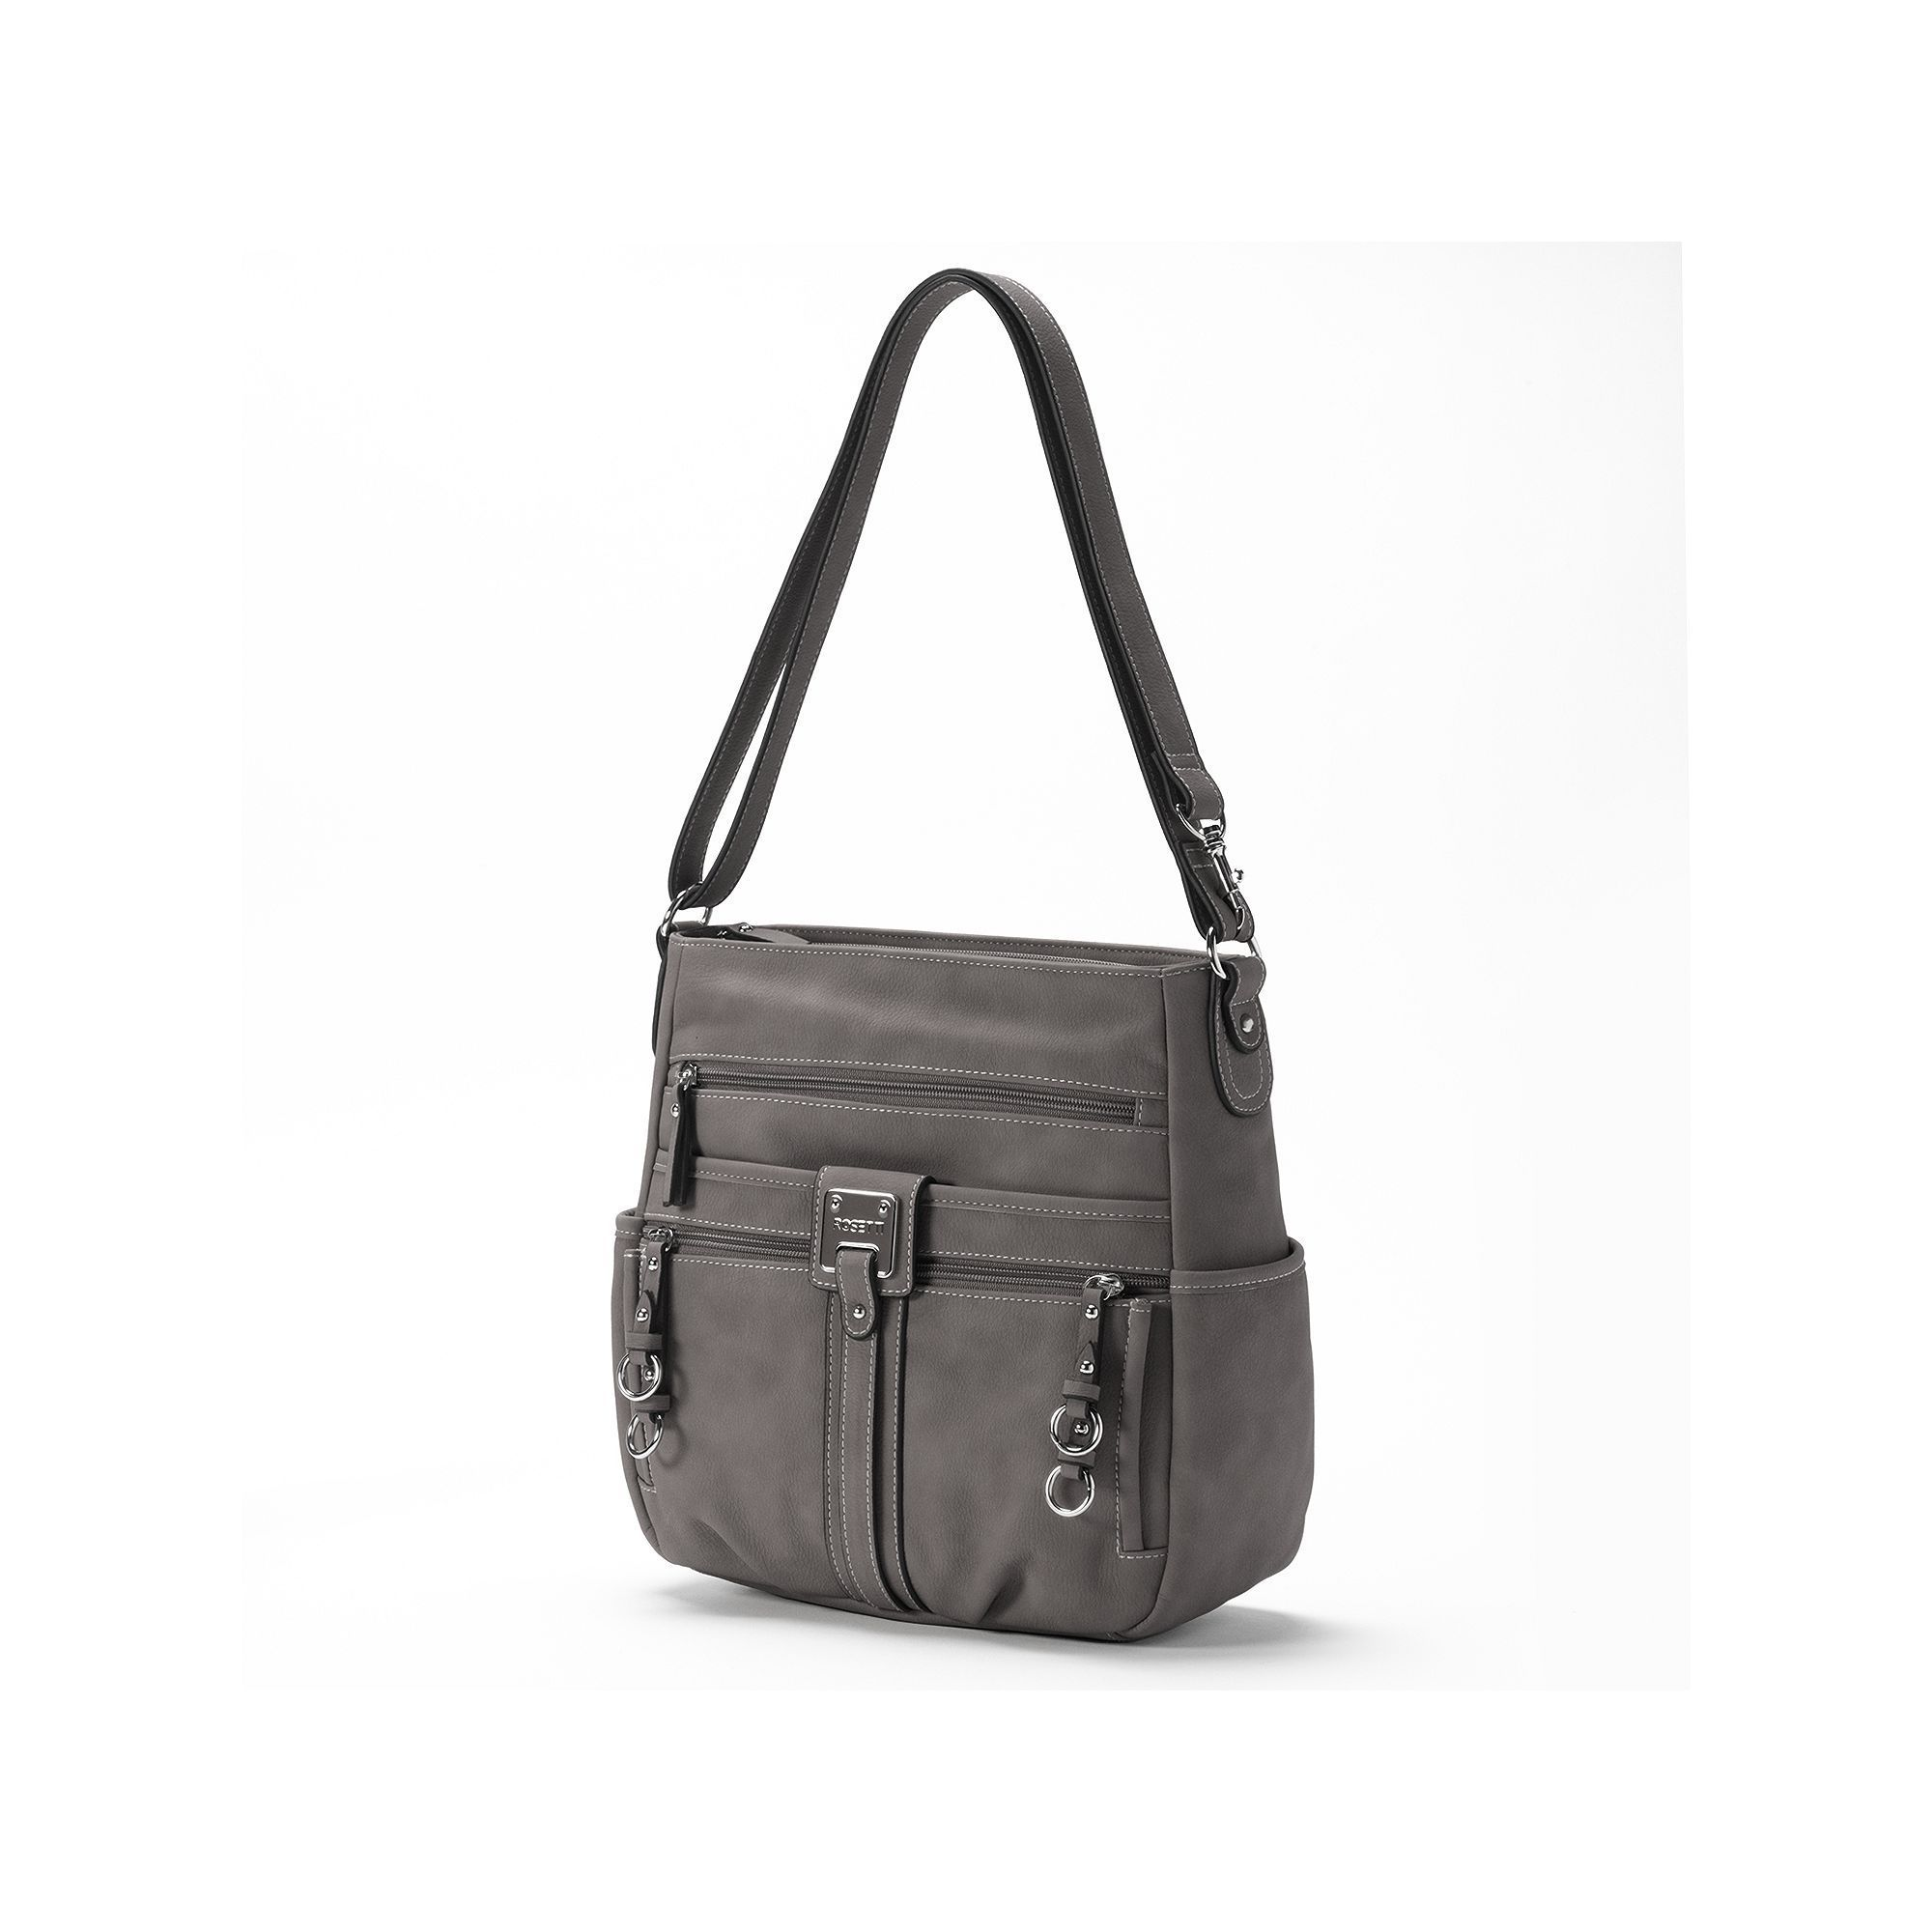 Women's Bags Sensible Handbag Purse Bucket Straw Bag Casual Pearl Ladies Bags Zipper Bags Cute Bear Purse Designer Bag Women Handbags